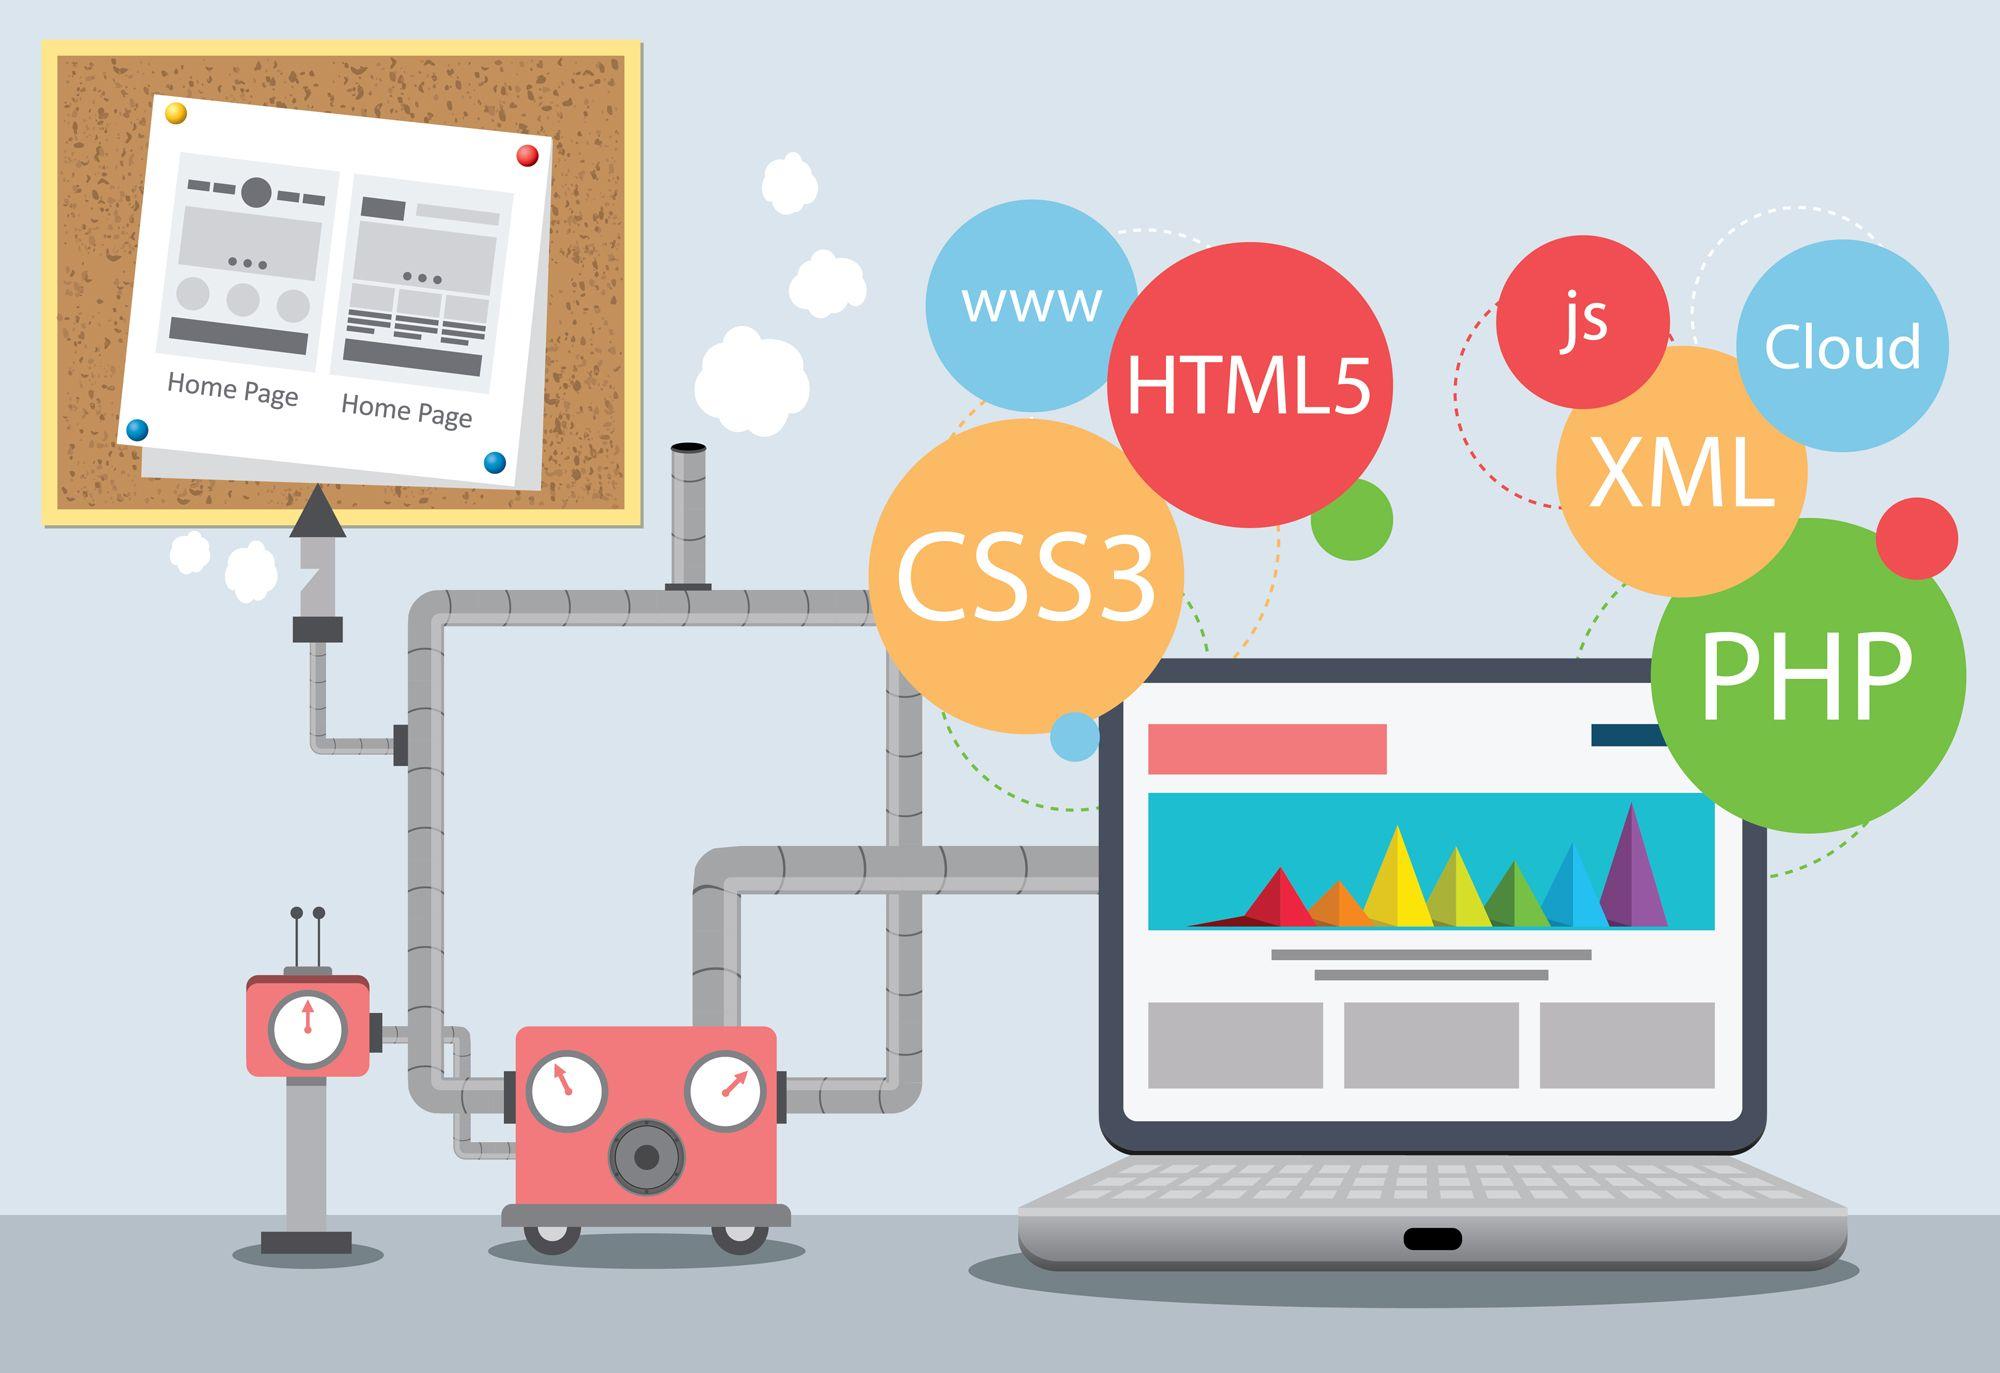 Realtimecampaign Com Promotes Sql Software And Company Website Building Web Design Company Web Design Services Website Development Company